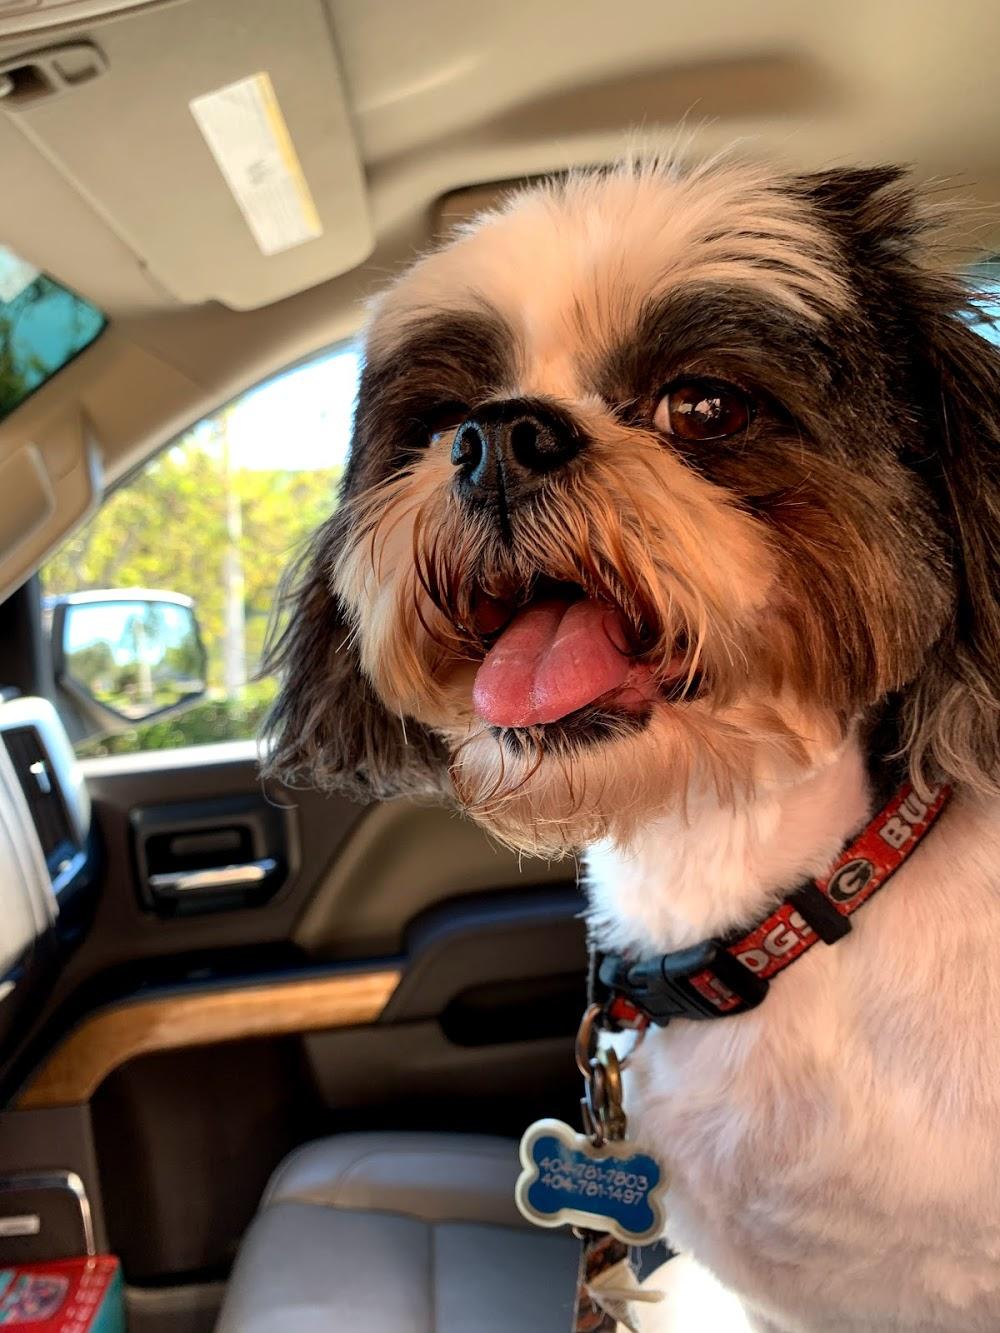 Dog In Sudz Grooming